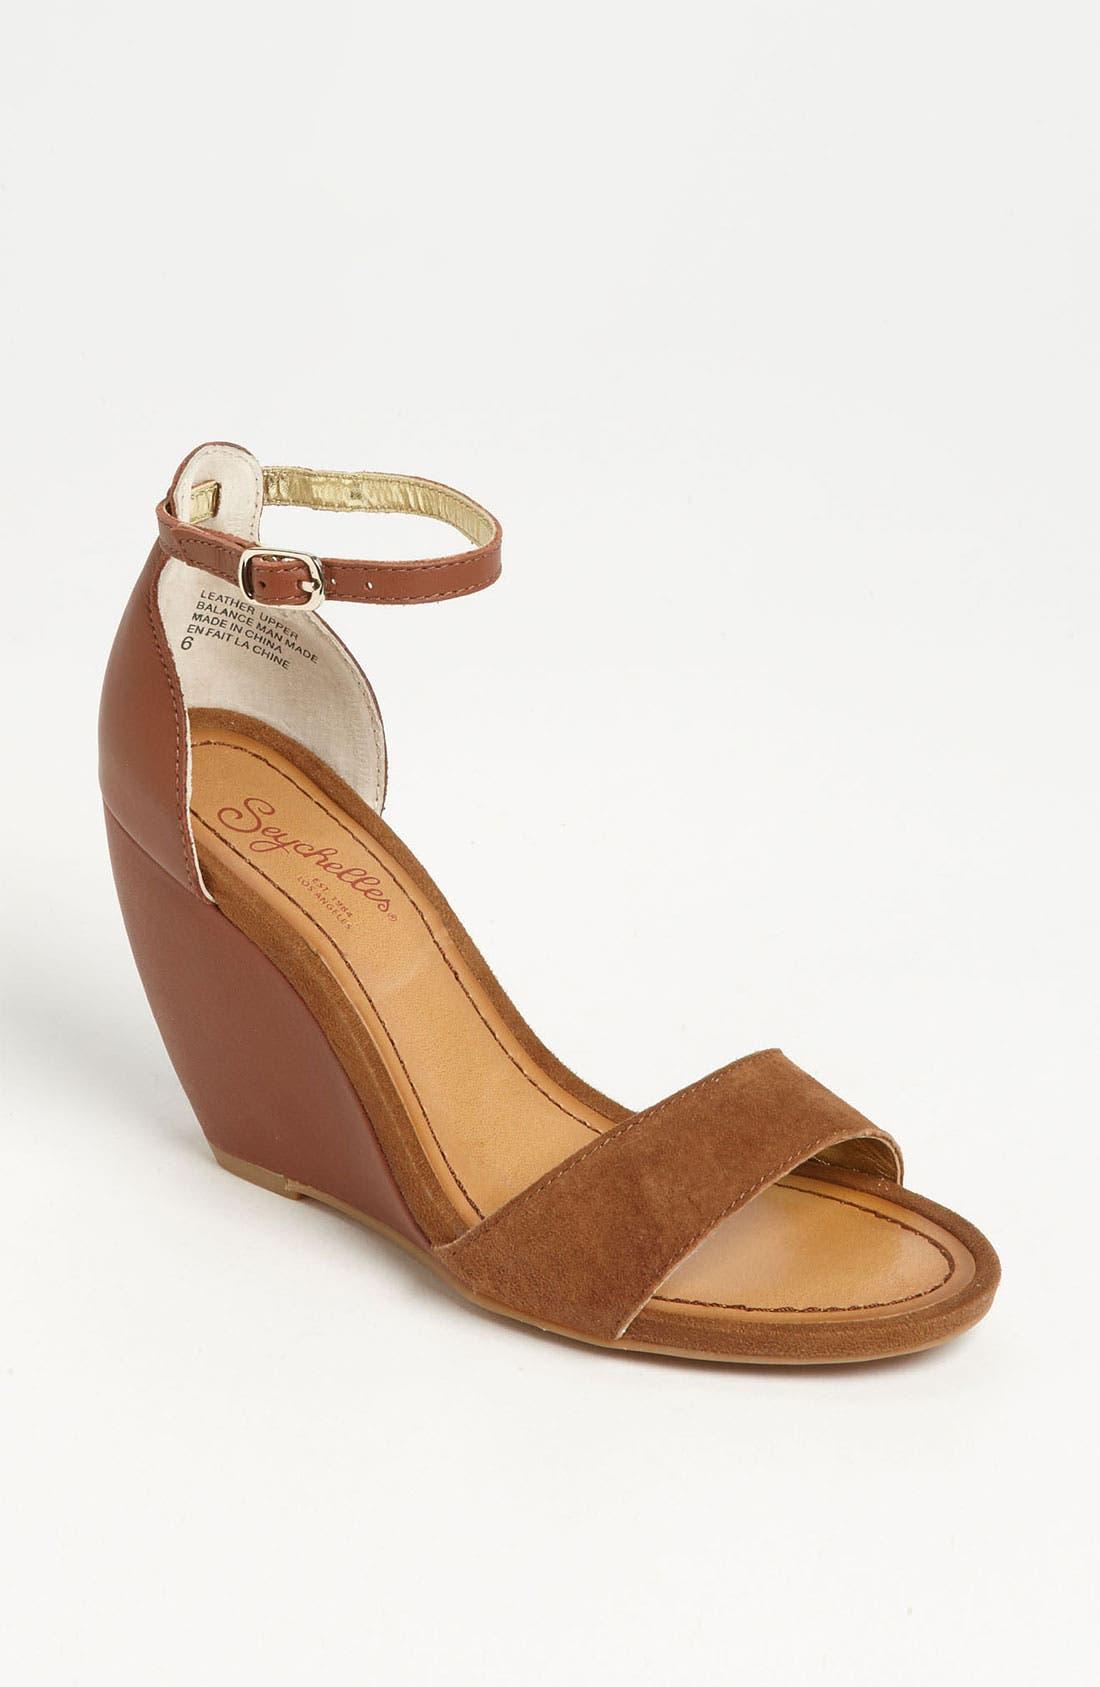 Main Image - Seychelles 'Thyme' Sandal